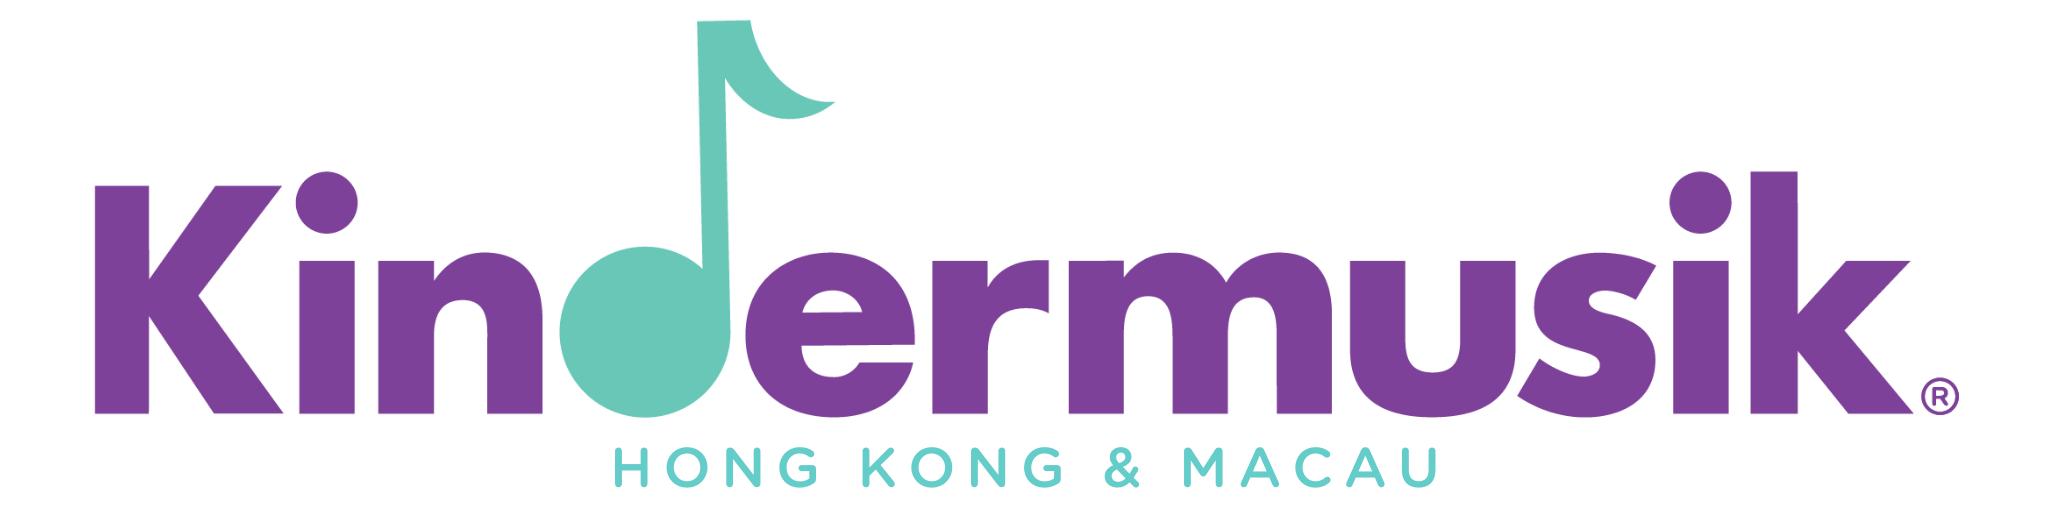 Kindermusik – Hong Kong & Macau